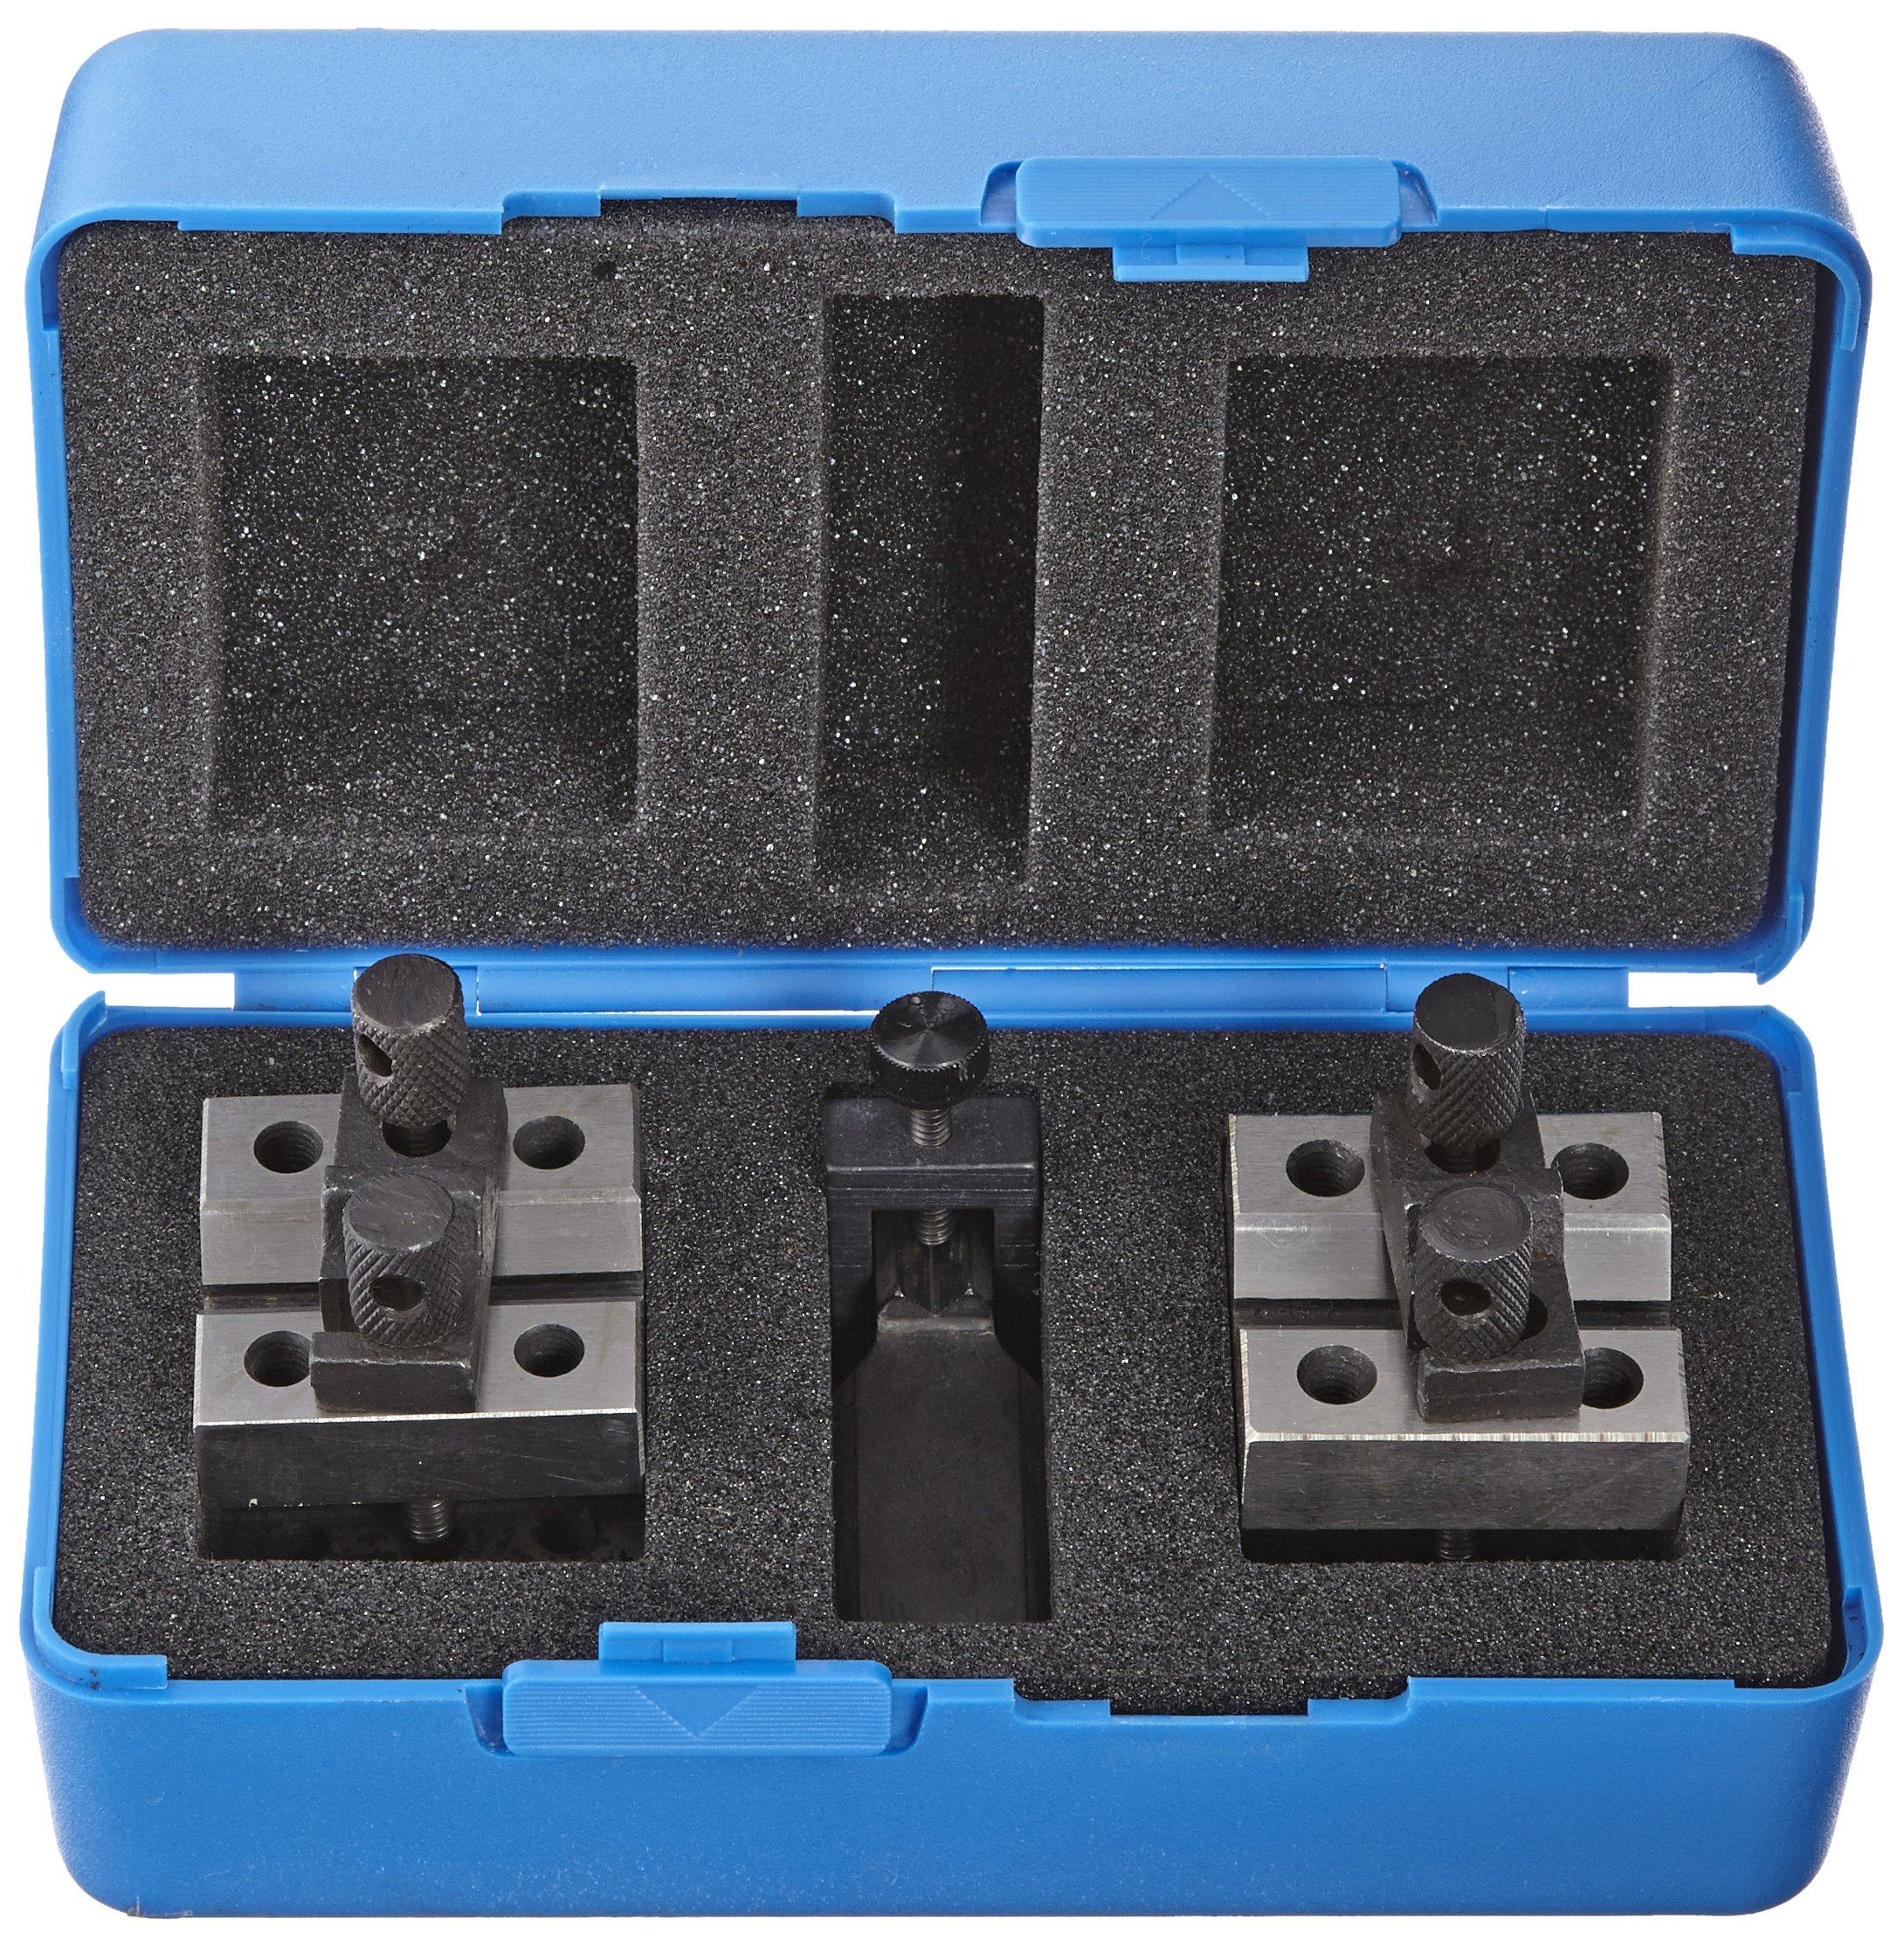 Fowler 52-475-025 Chrome Steel X-BLOX-JR Precision V-Block Set, 0.030'' - 1.285'' Set Capacity